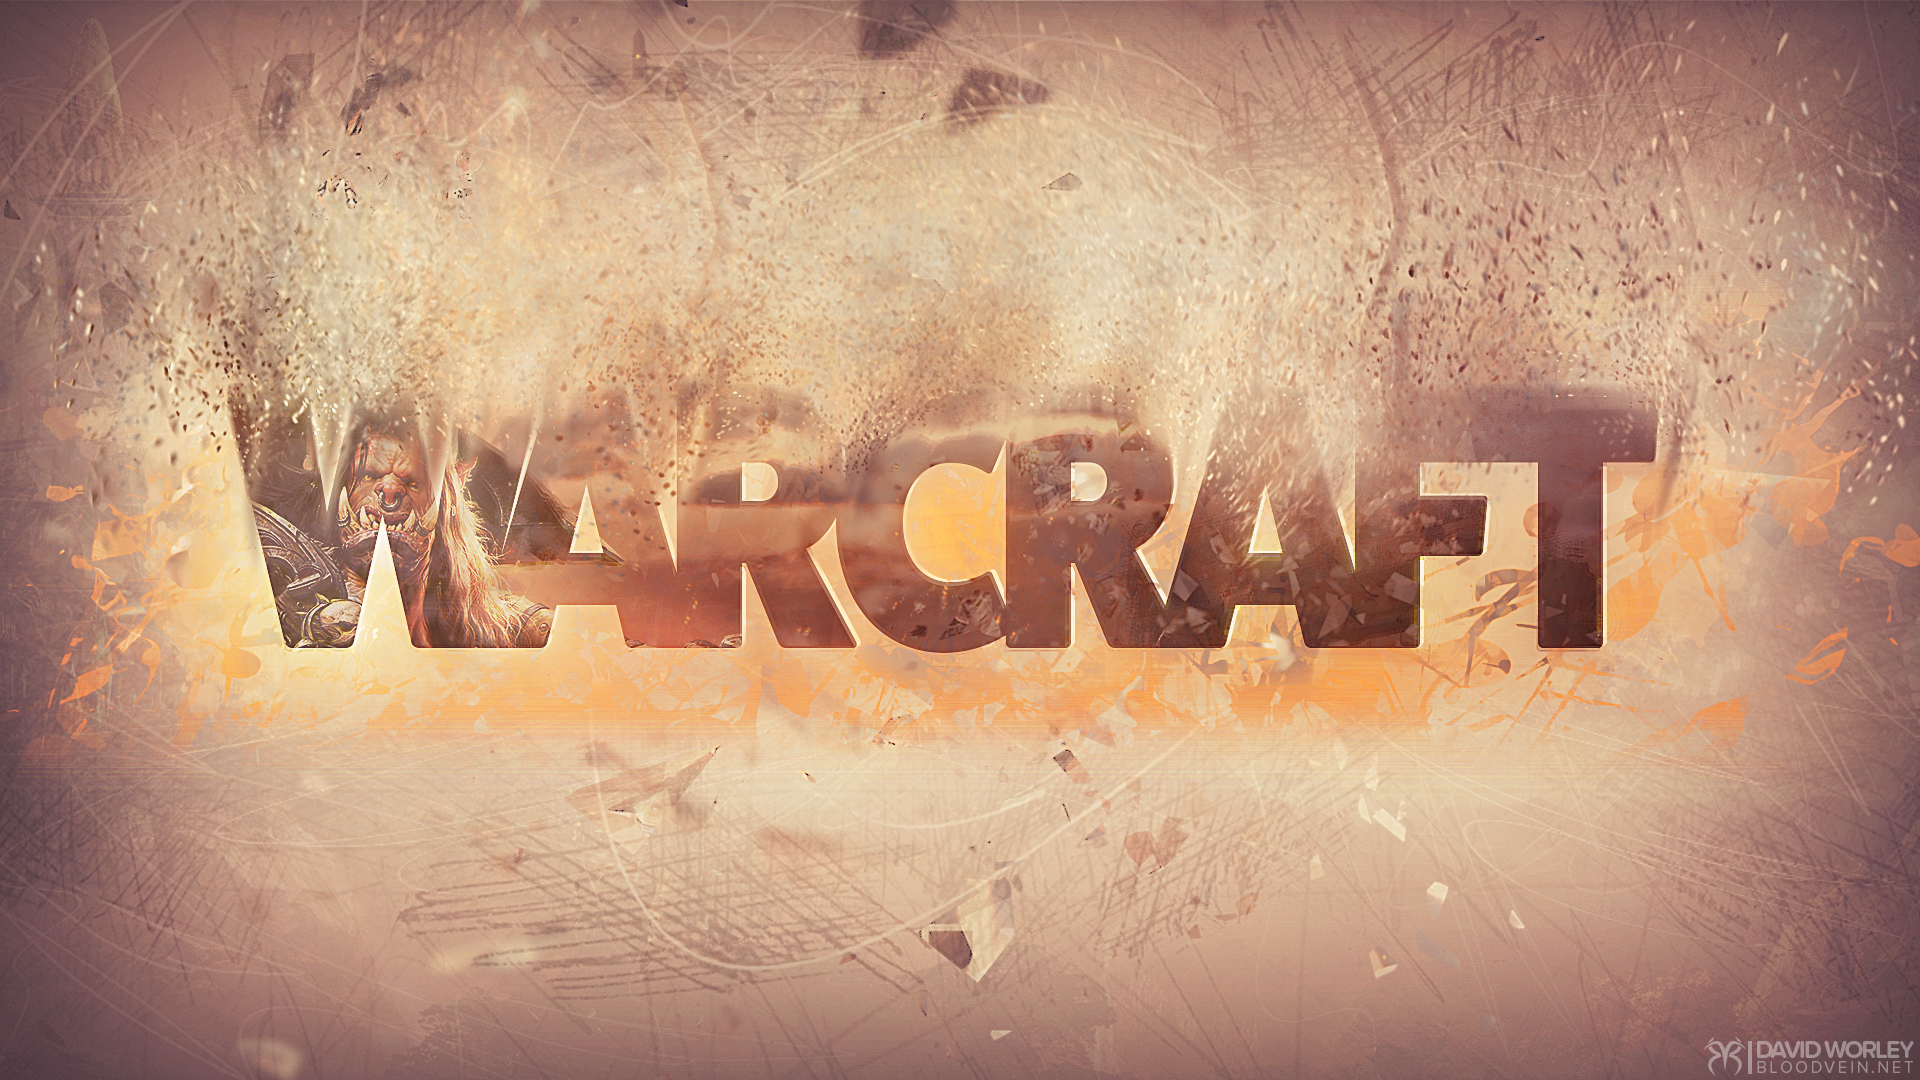 World of Warcraft Epic Text Wallpaper HD